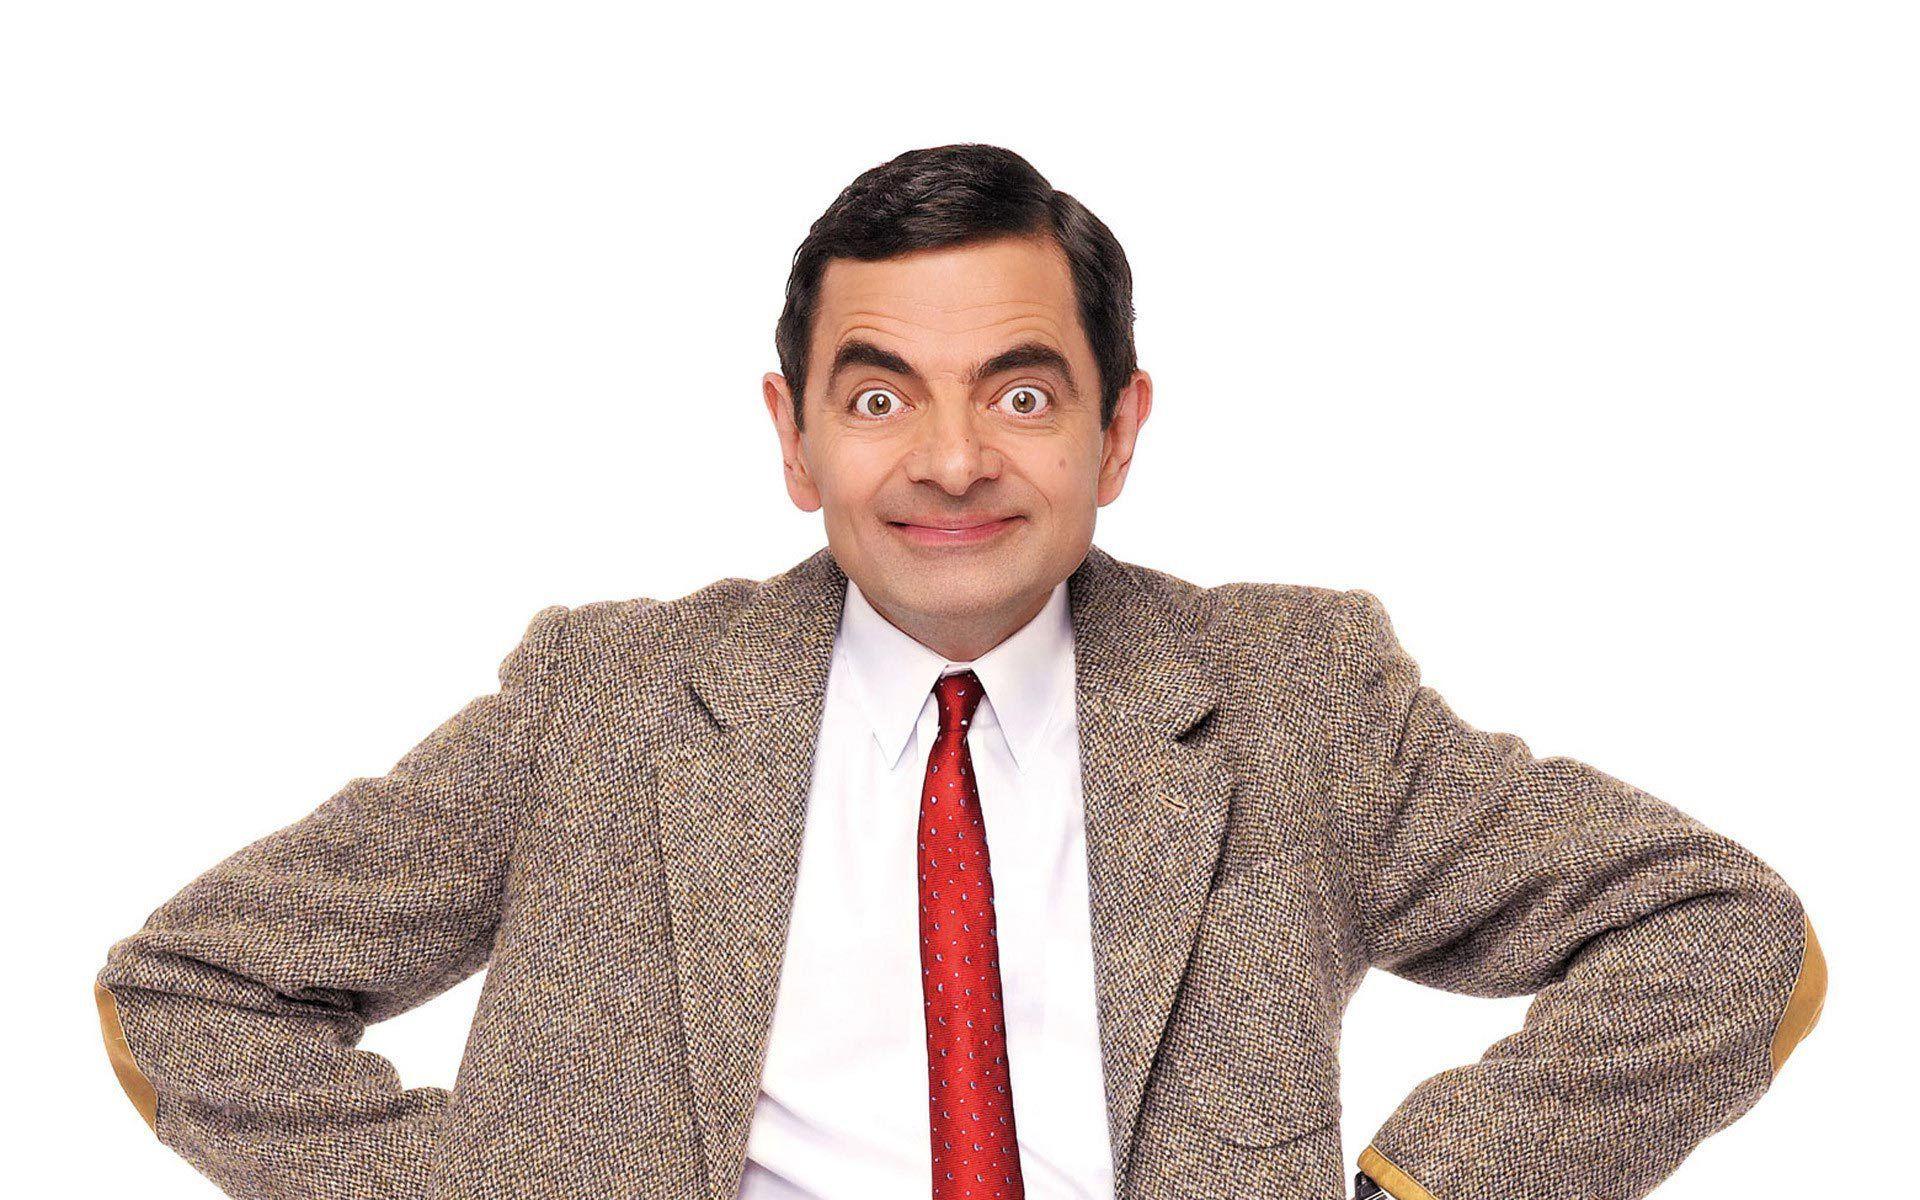 Mr Bean Nativity | christmas | Pinterest | Mr bean, Beans and Mr ...